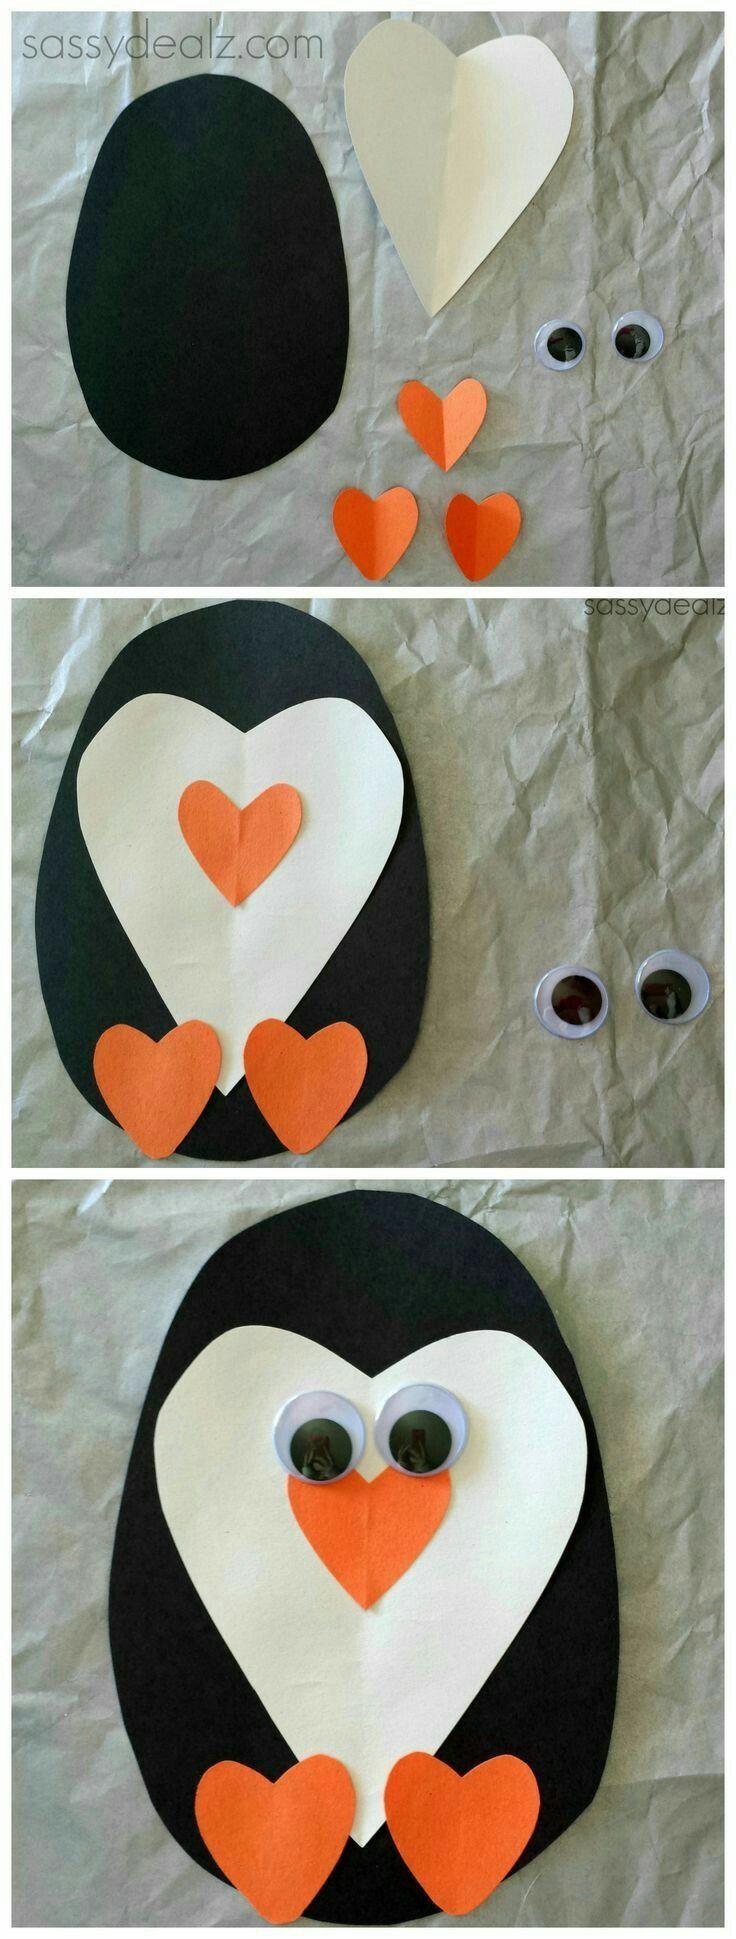 Paper Heart Penguin craft for kids.